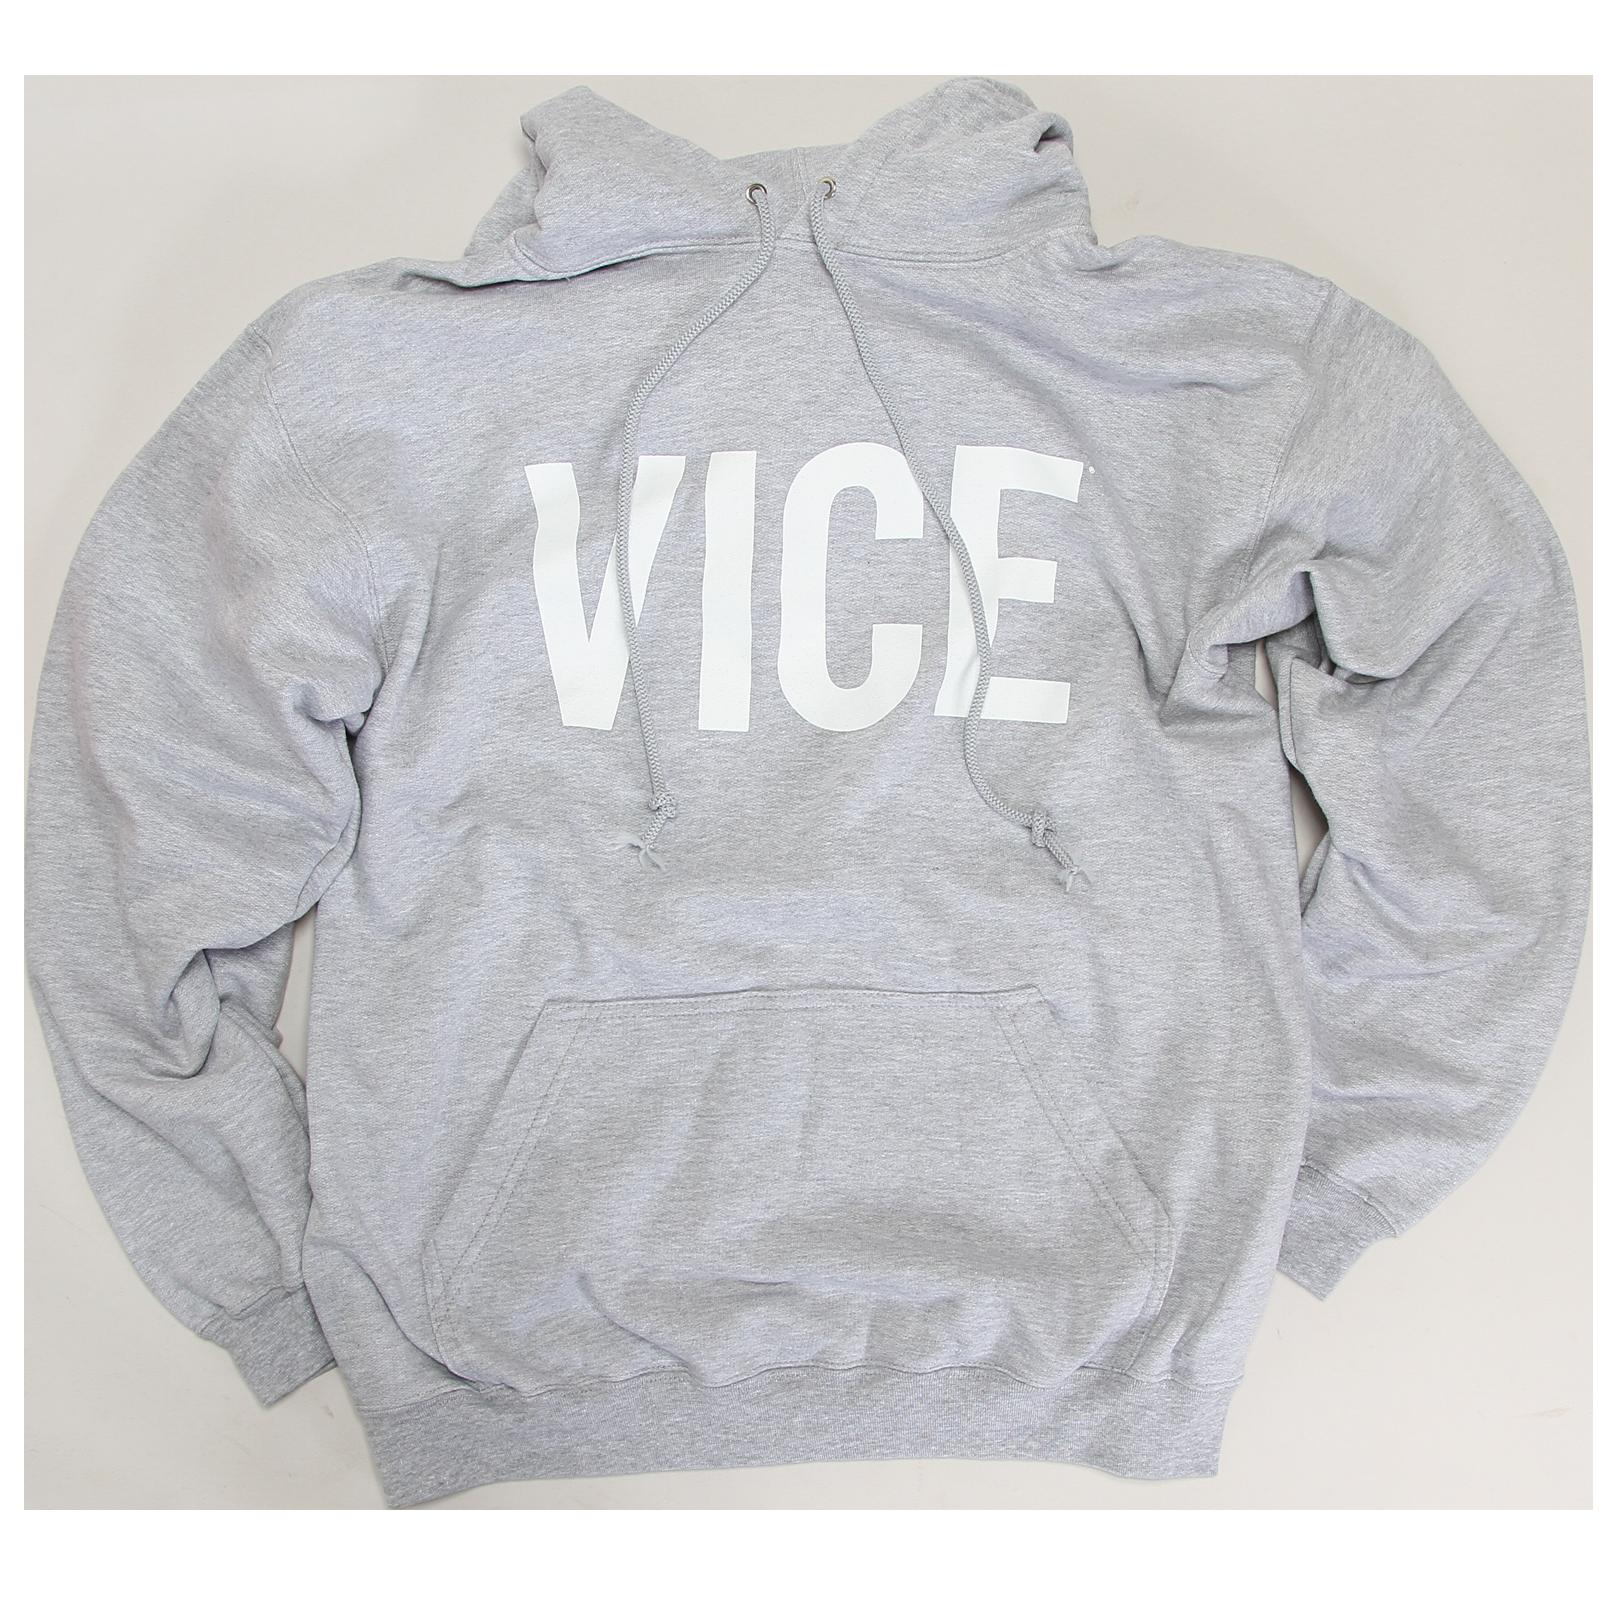 Sweatshirt clipart grey hoodie. Vice canada